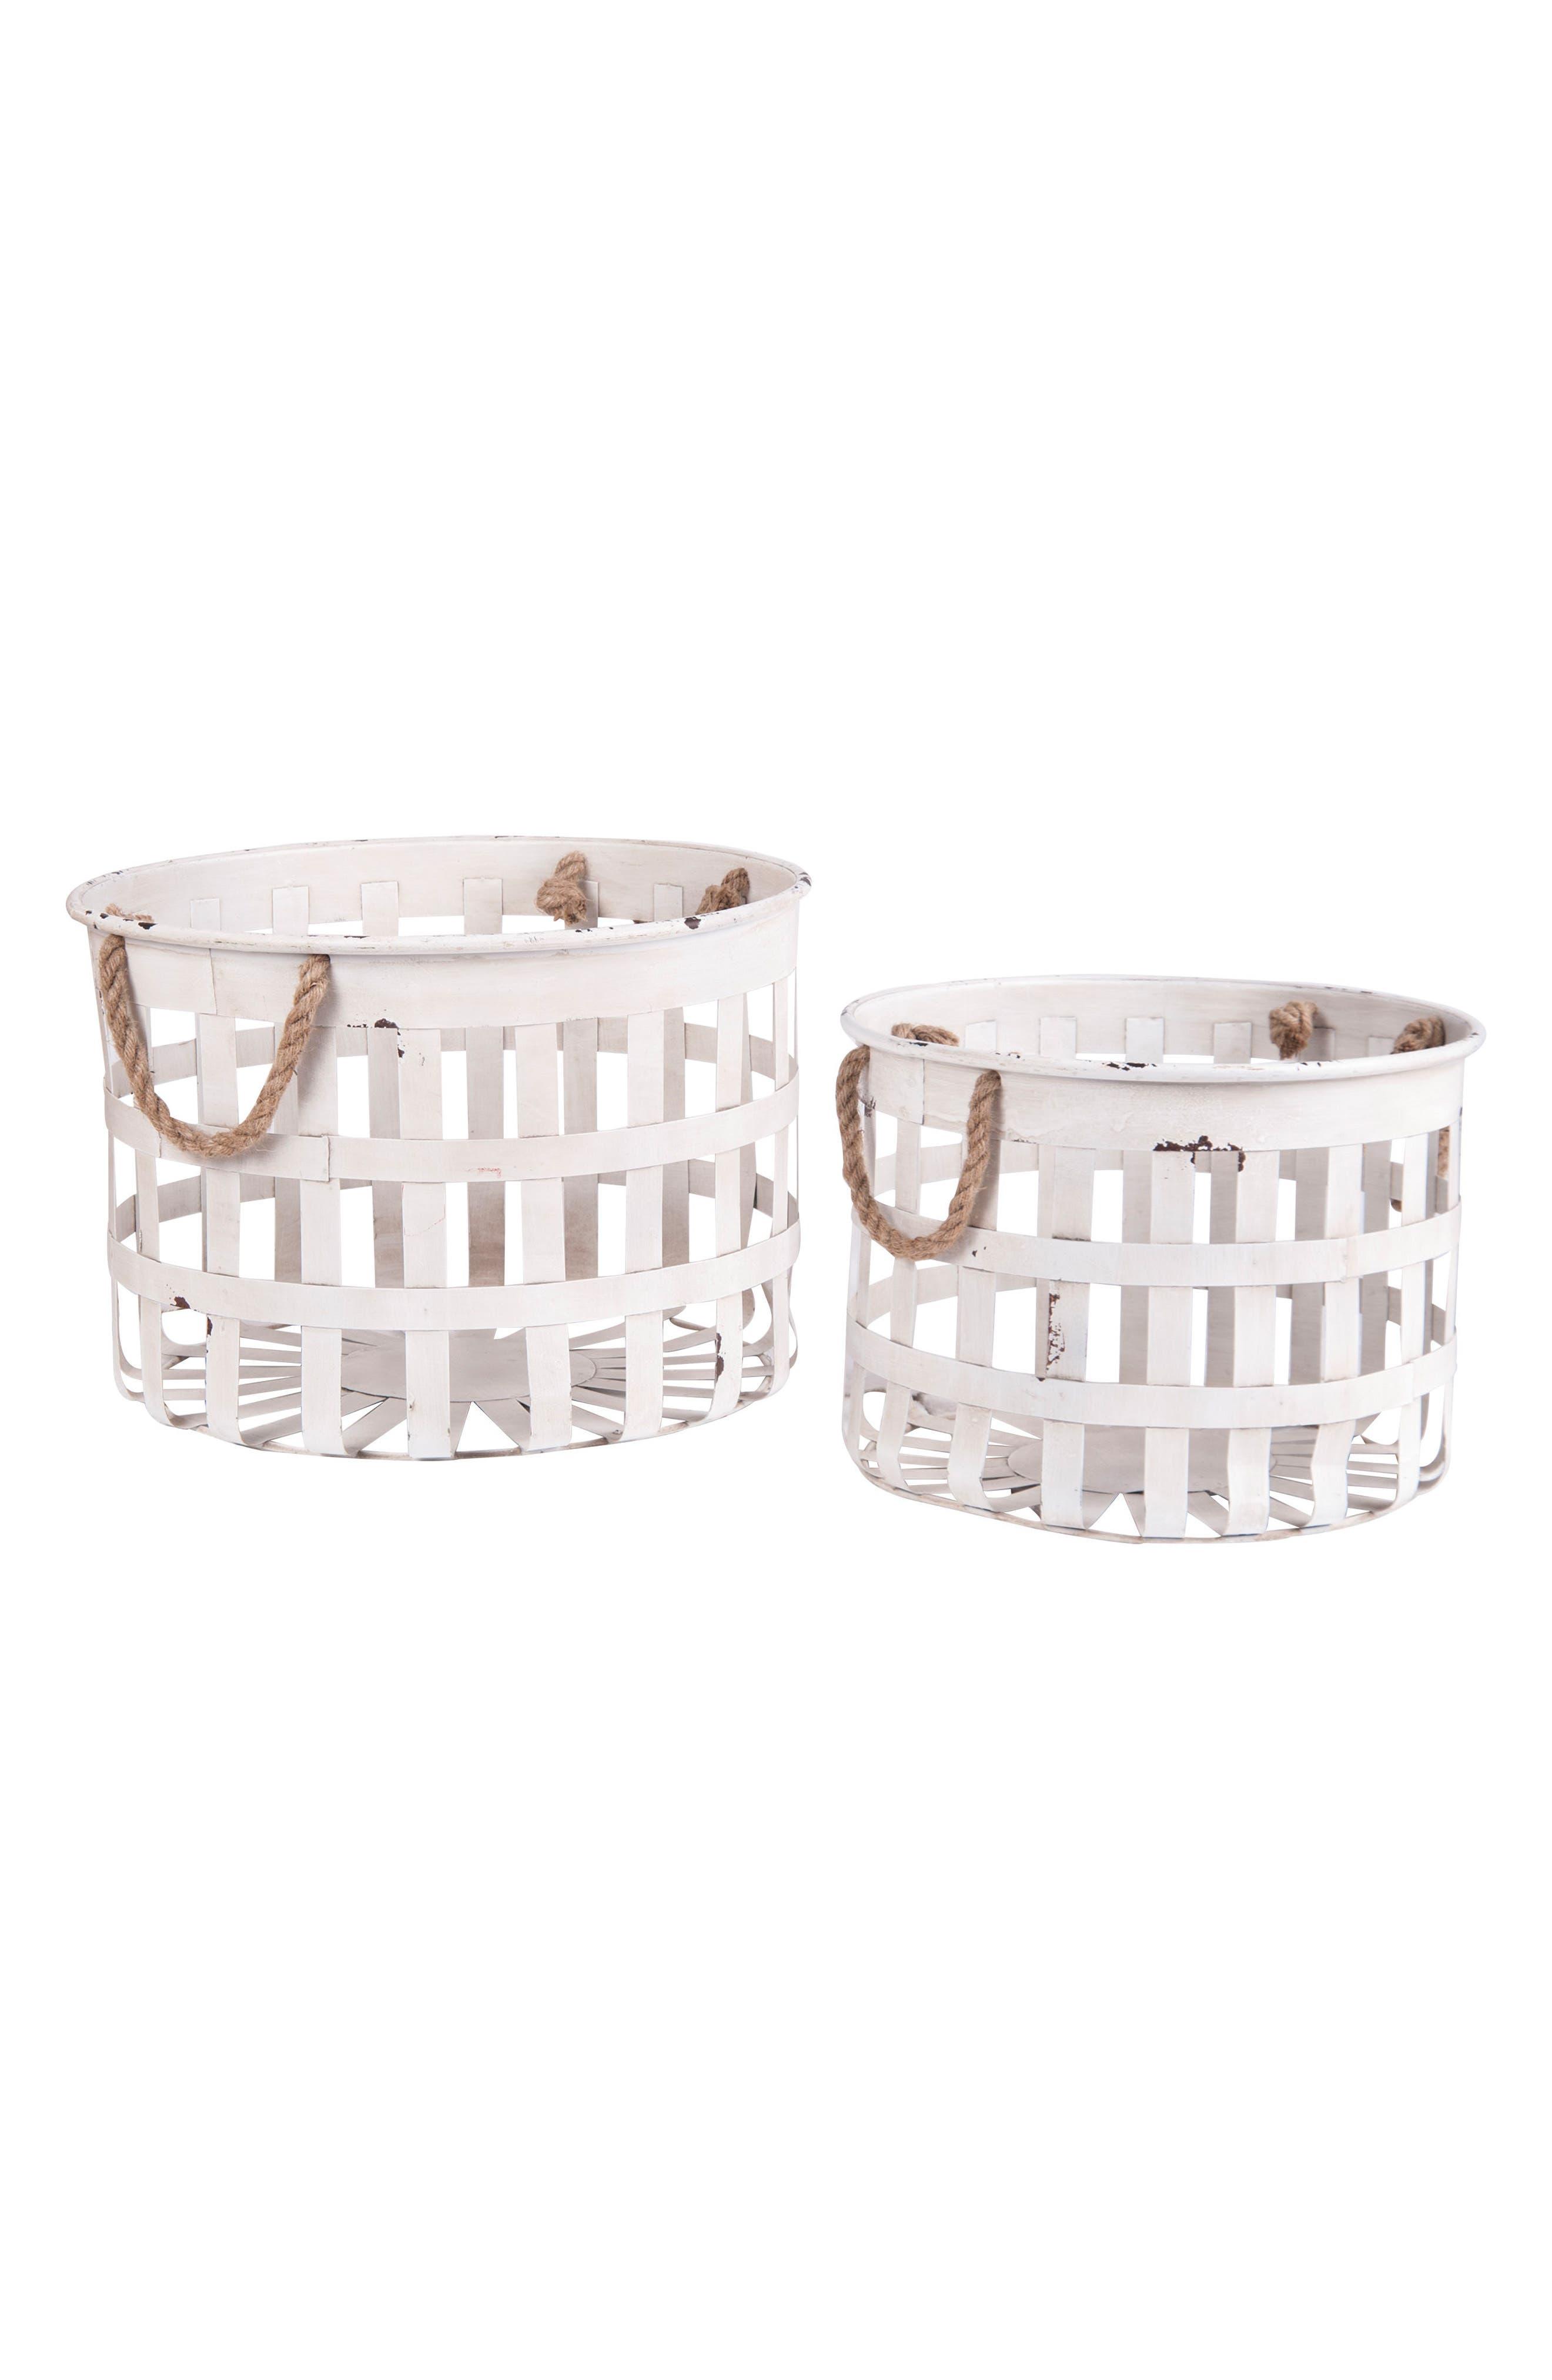 Set of 2 Nesting Baskets,                         Main,                         color, Metal/ Rope